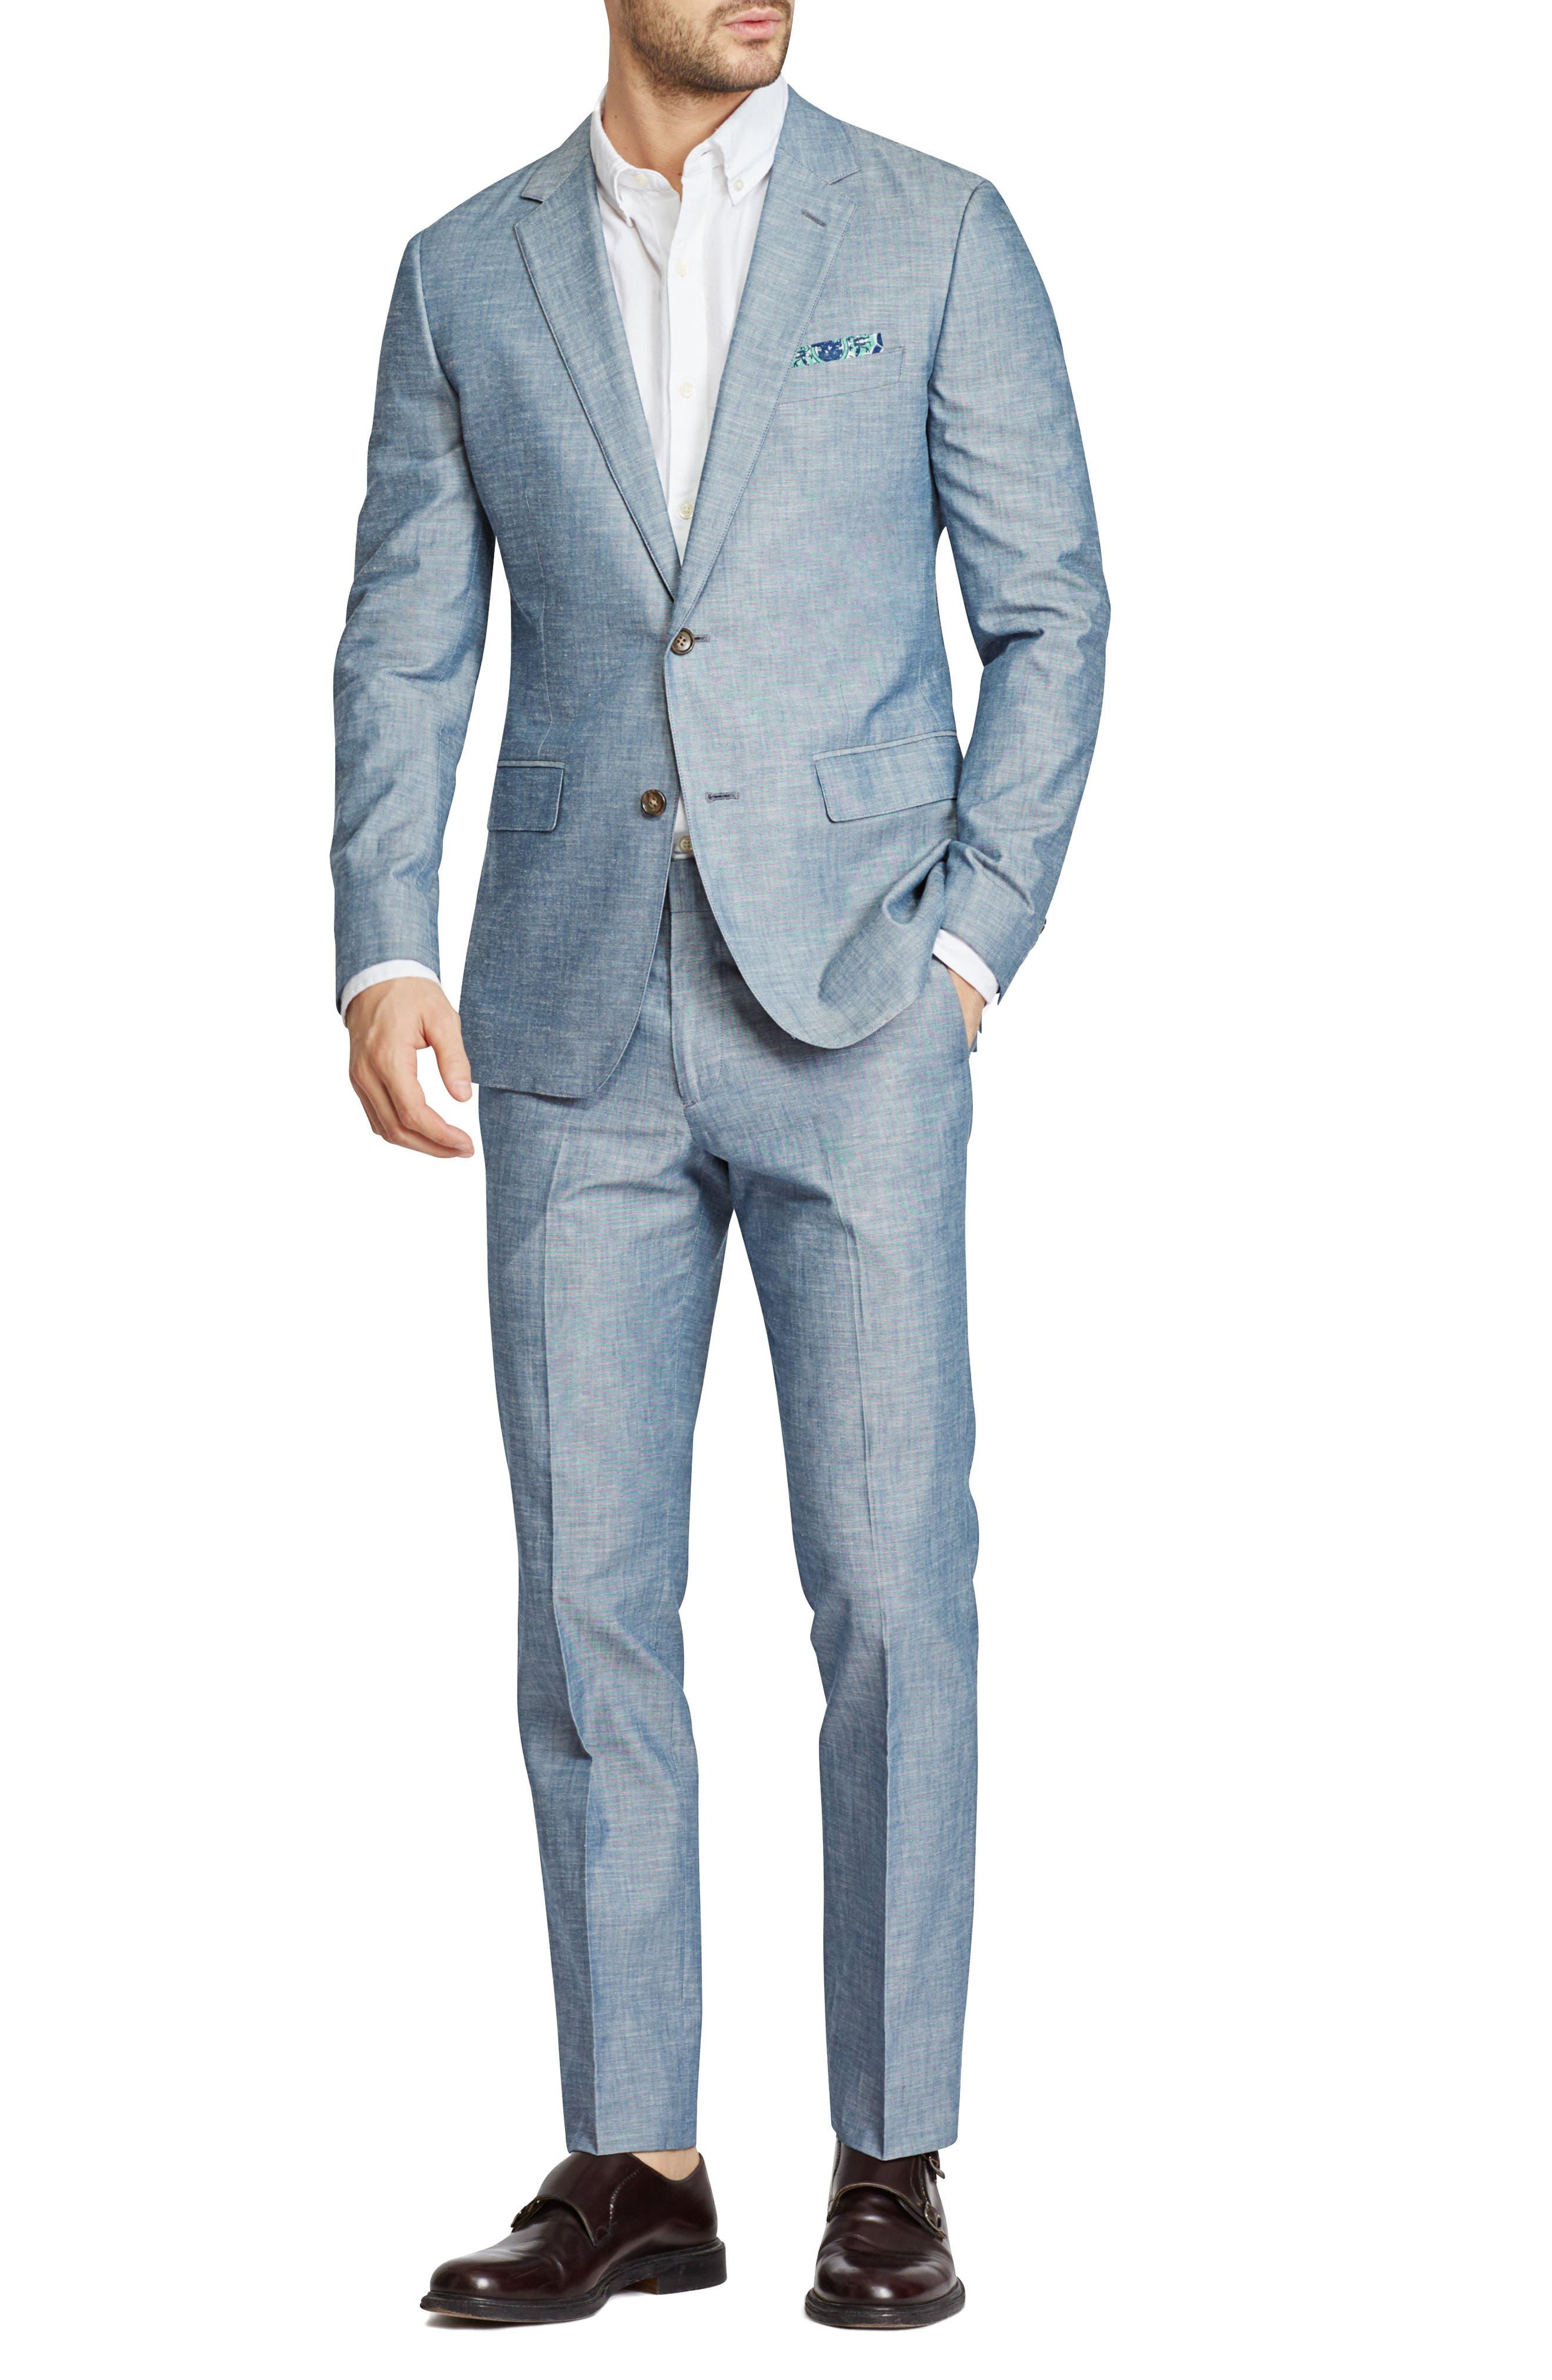 BONOBOS Slim Fit Chambray Cotton Blazer, Main, color, SOLID BLUE